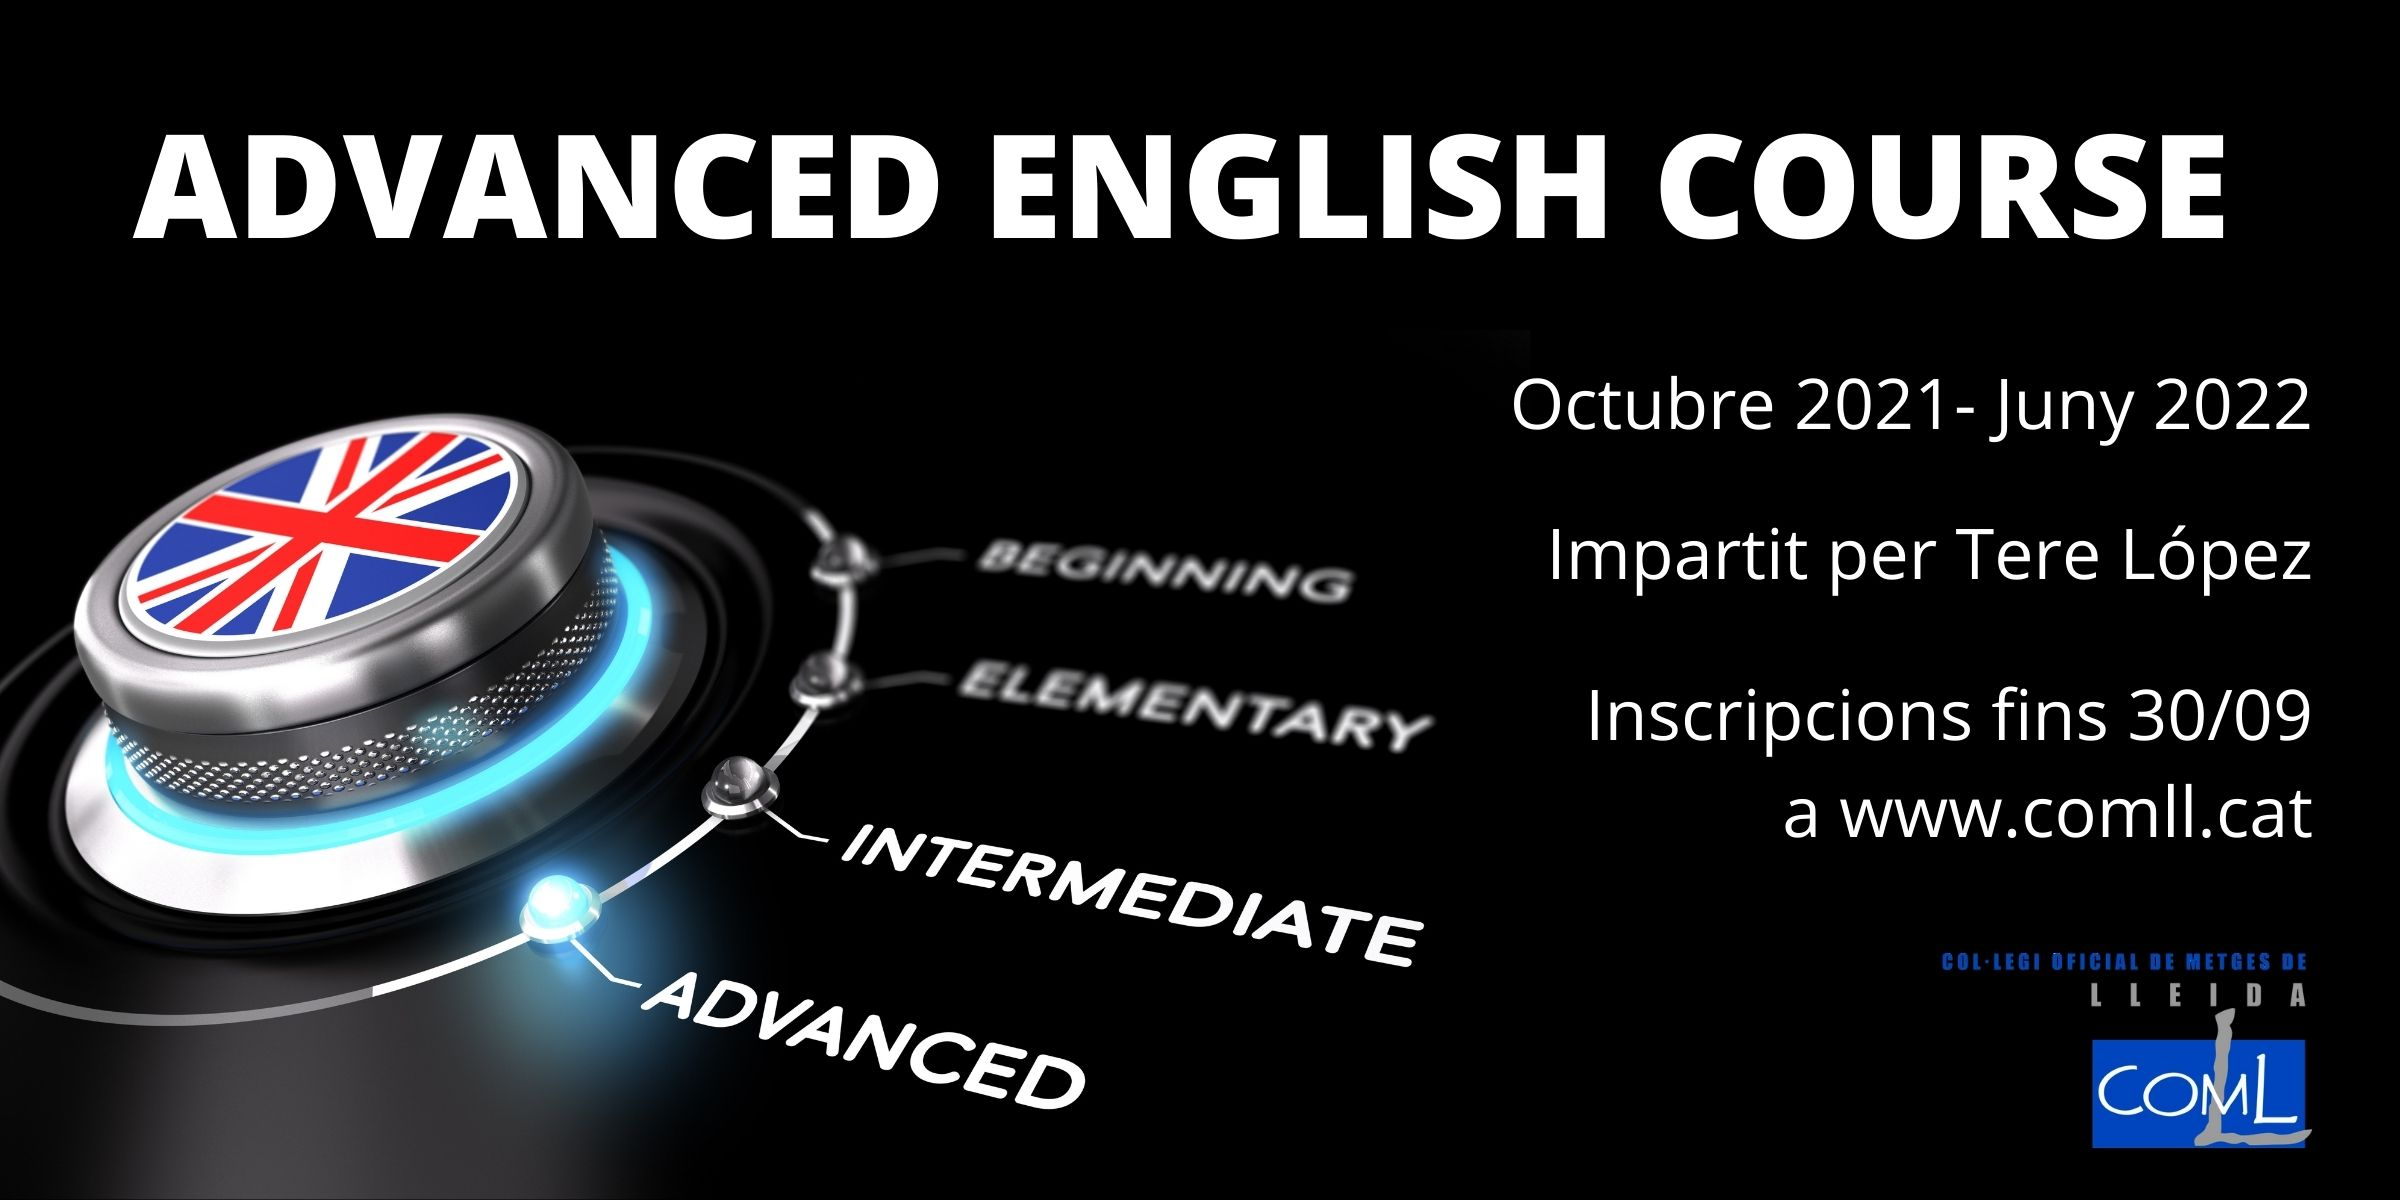 ADVANCED ENGLISH COURSE